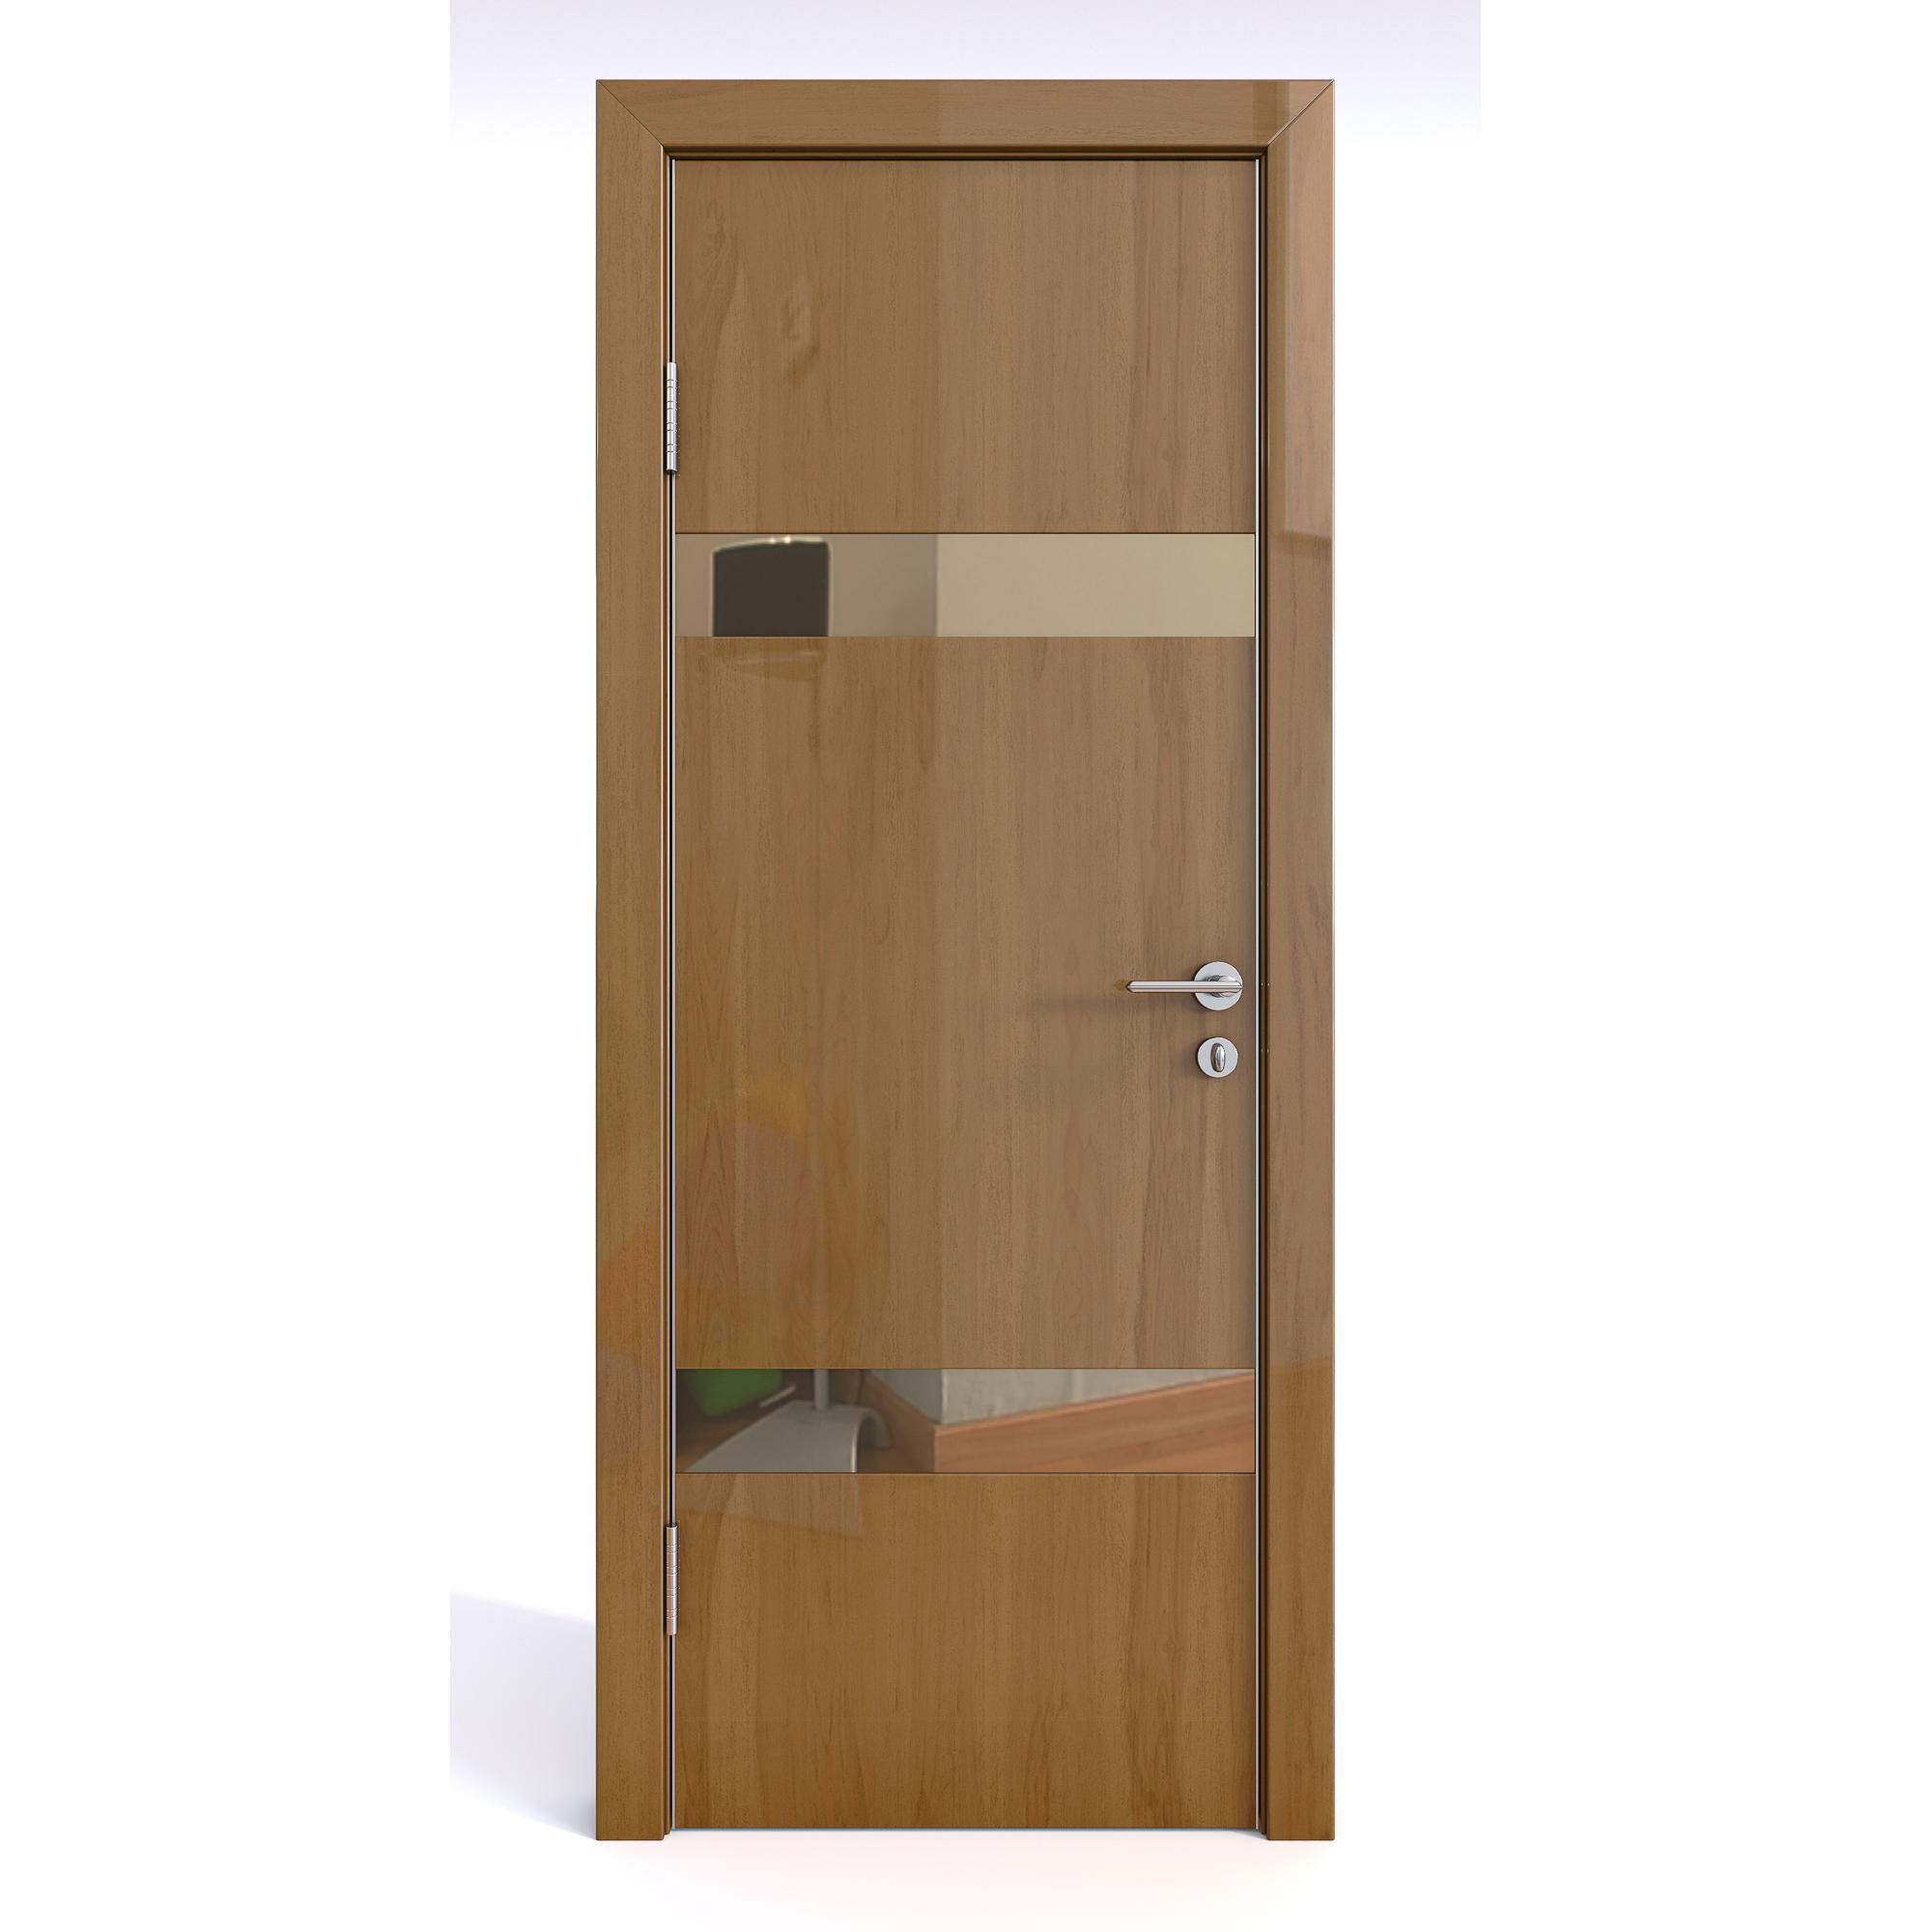 Межкомнатная дверь ДО-502/2 Анегри темный глянец/бронза 200х60 фото